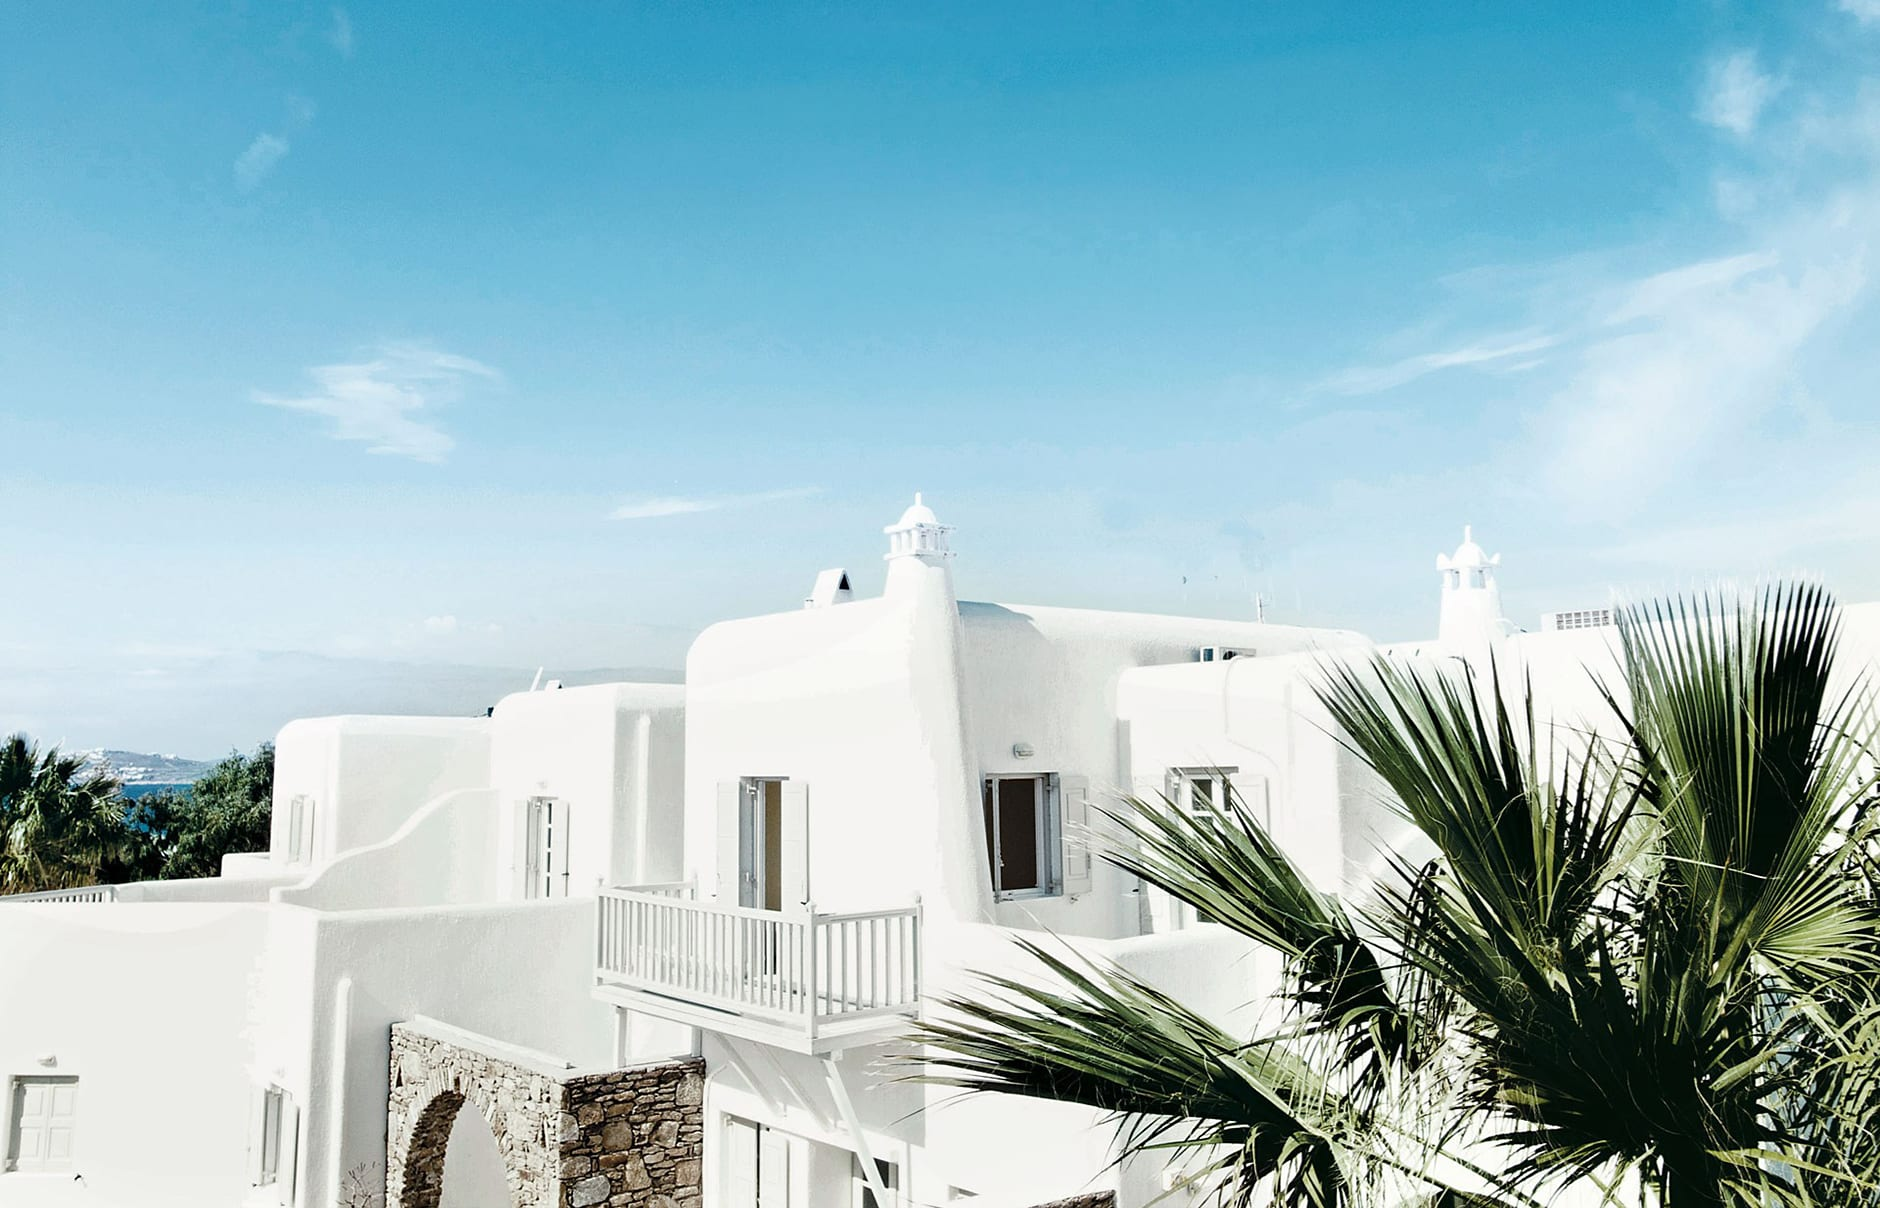 Exterior. San Giorgio Mykonos a Design Hotels™ Project, Greece. © SAN GIORGIO